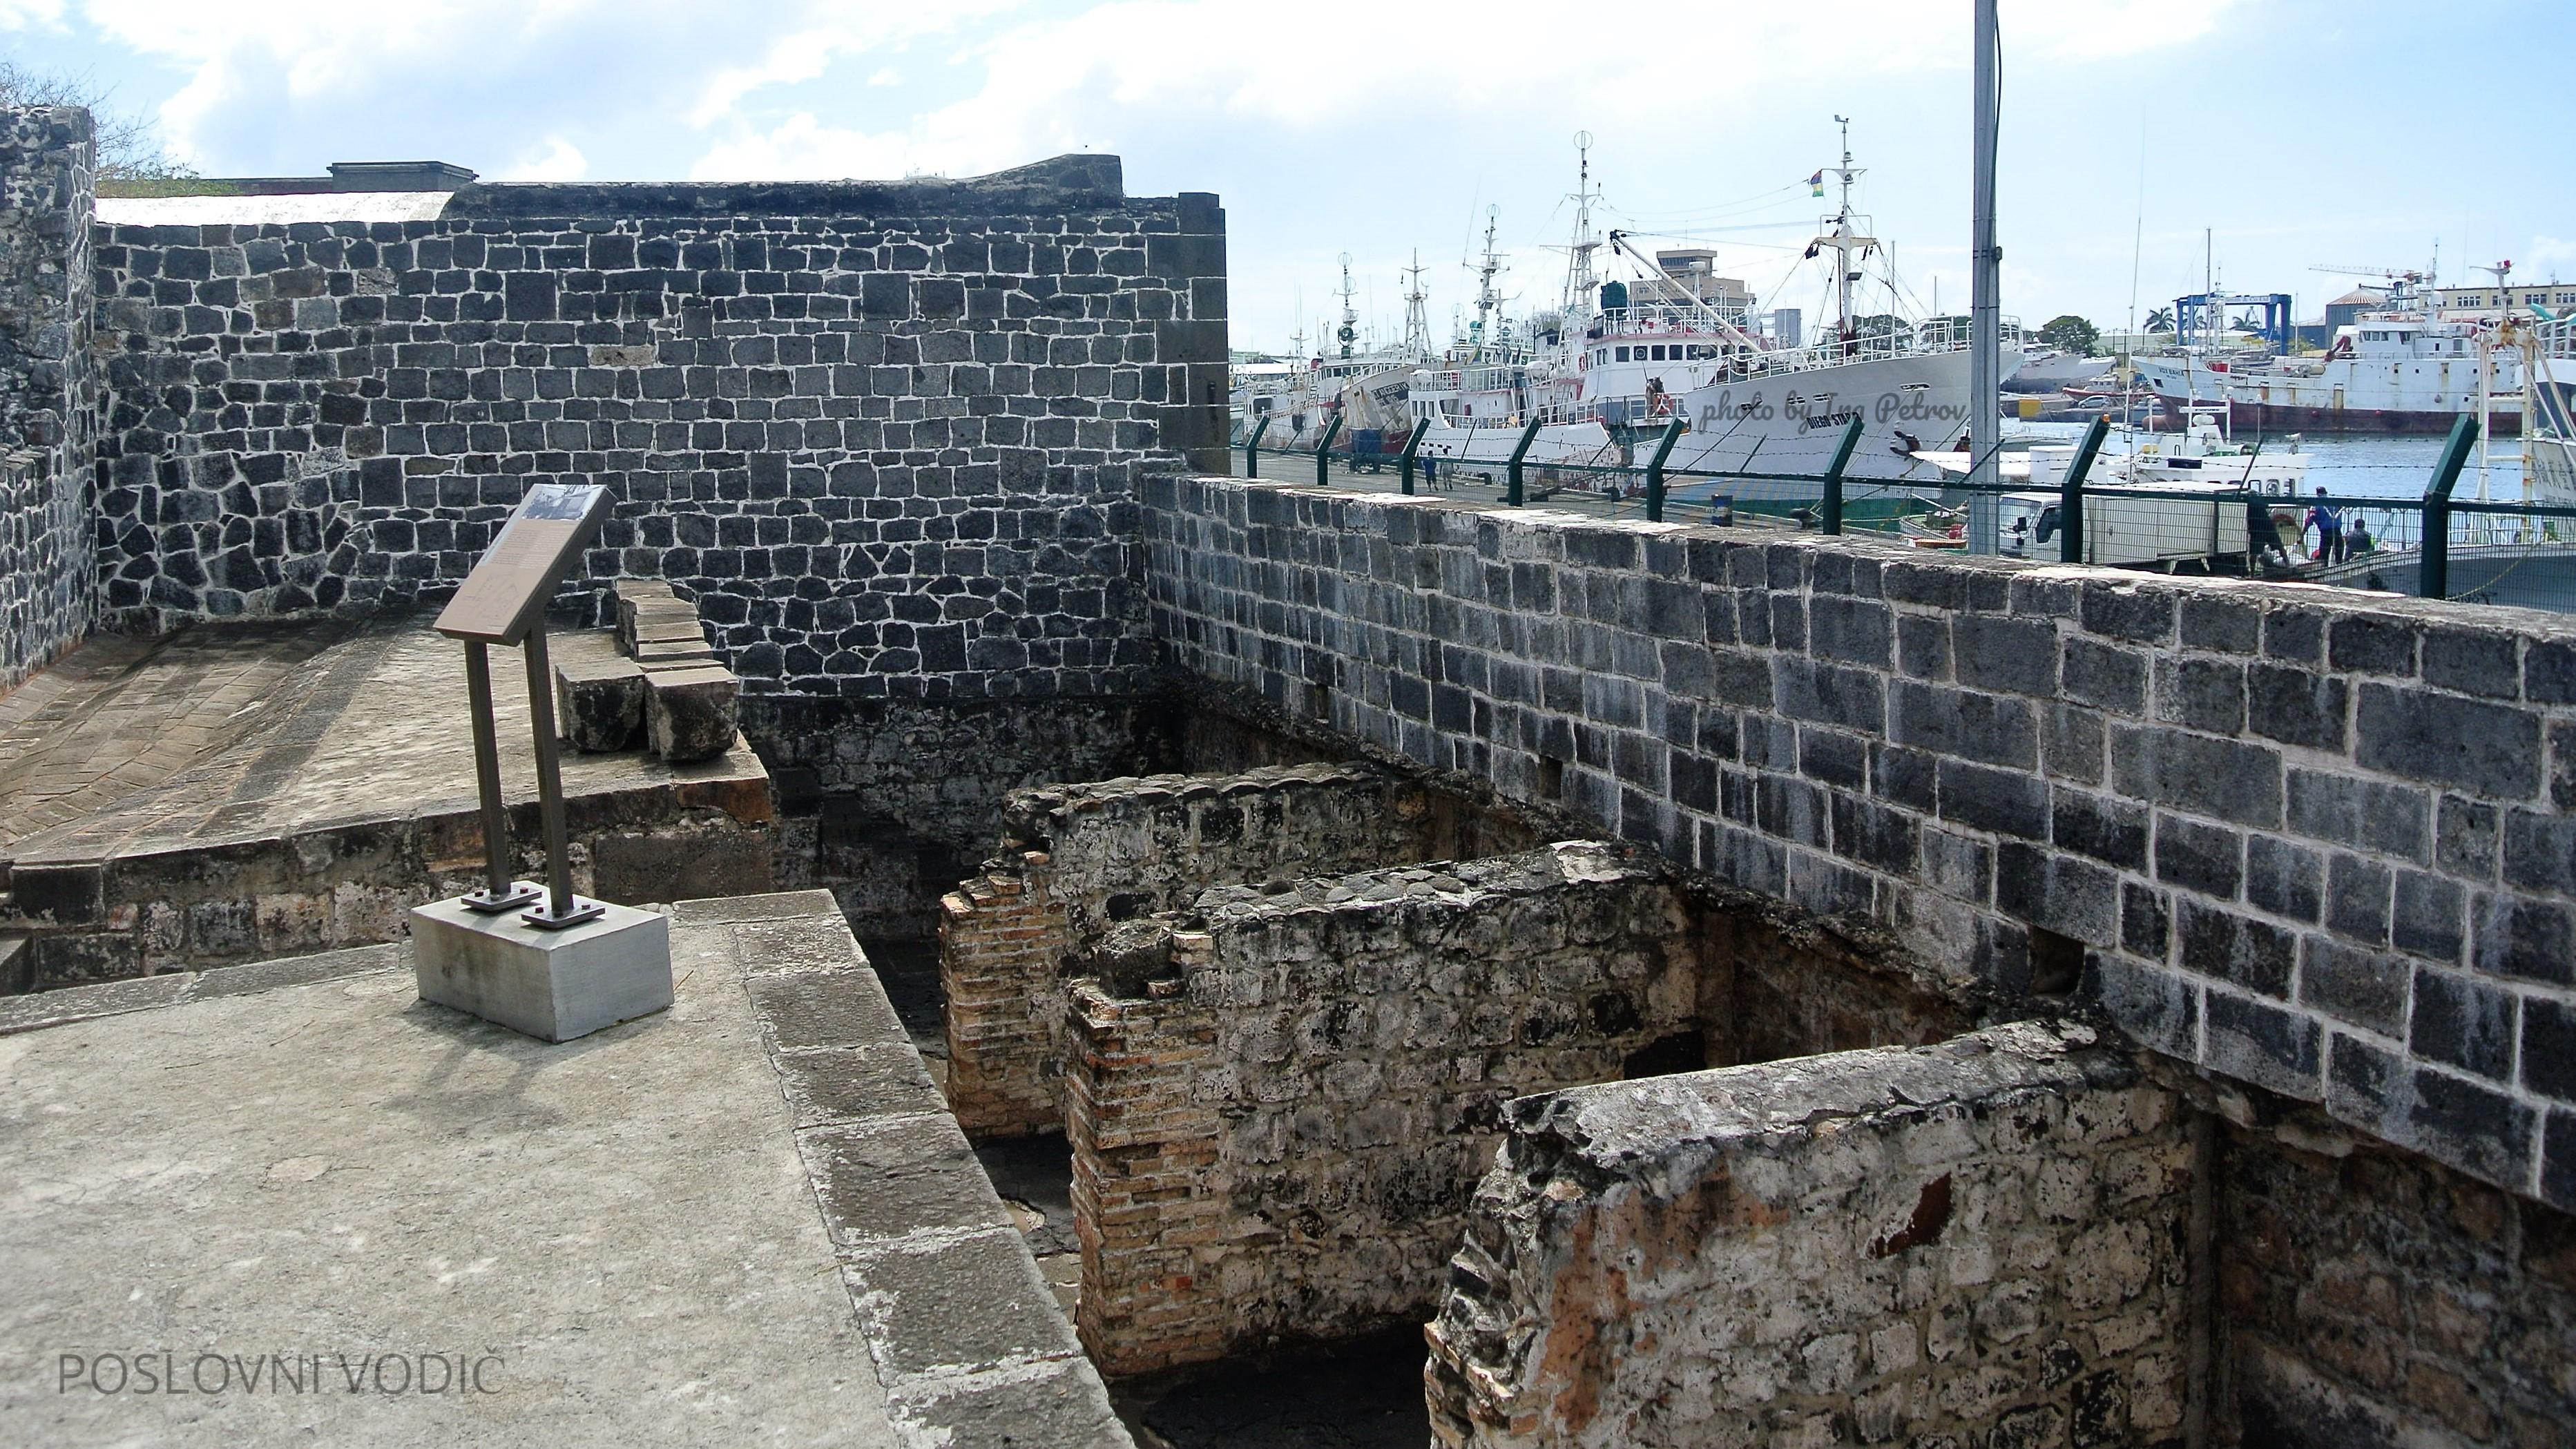 ostaci_nekadasnje_luke_apravasi_gat_port_luis_mauricijus_photo_by_ira_petrov